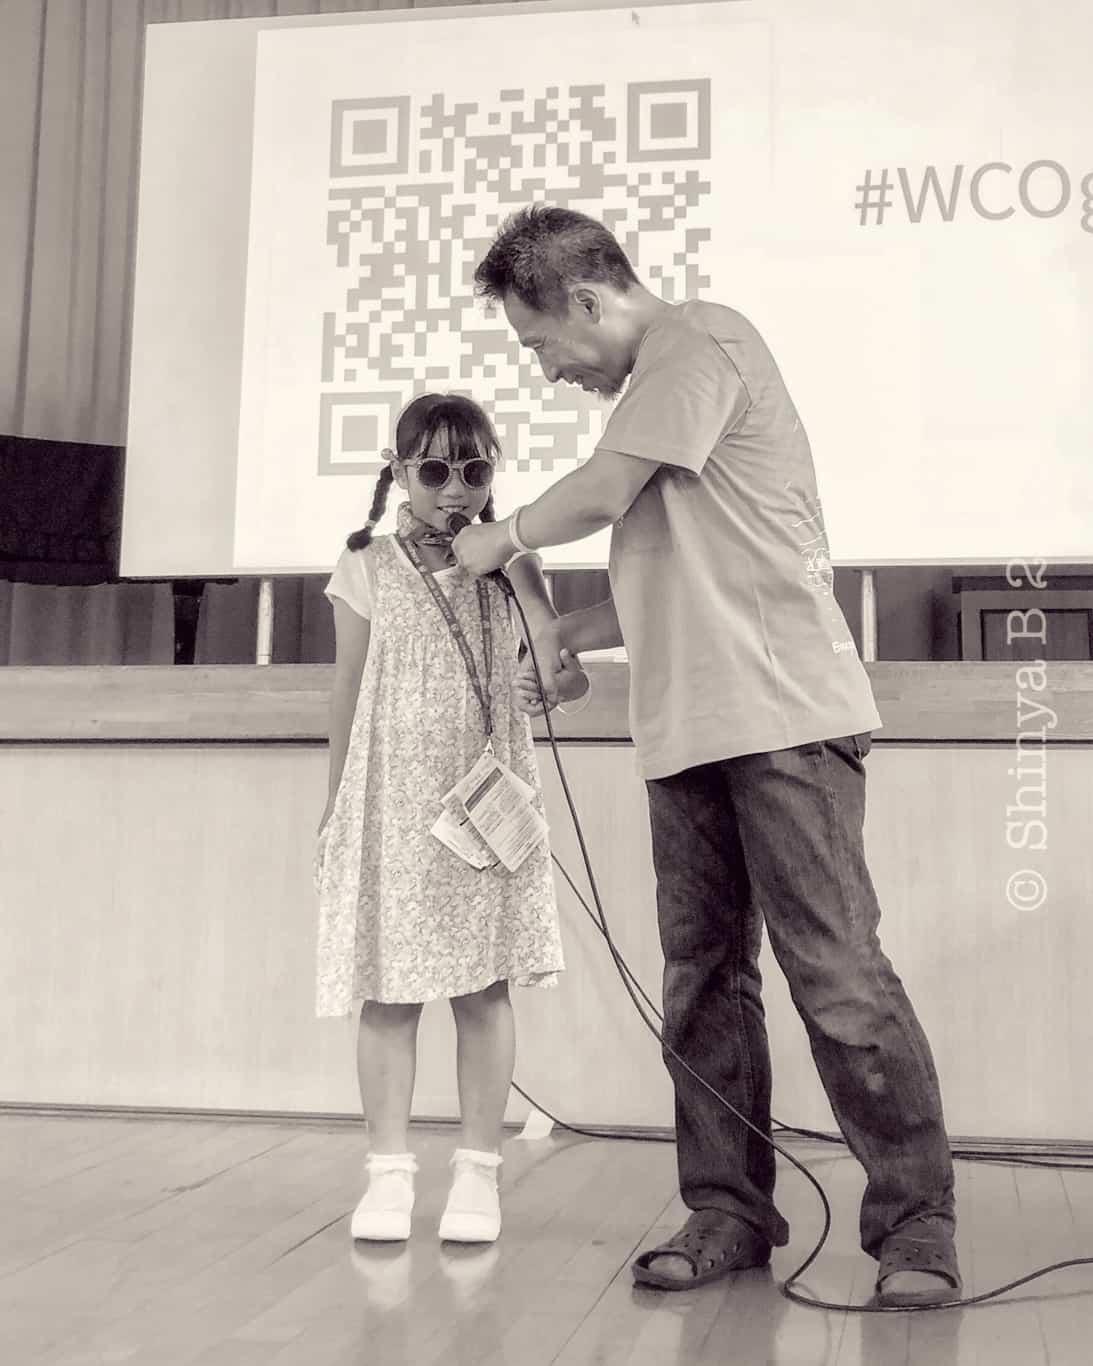 Hideaki Saiki, WordCamp Ogijima